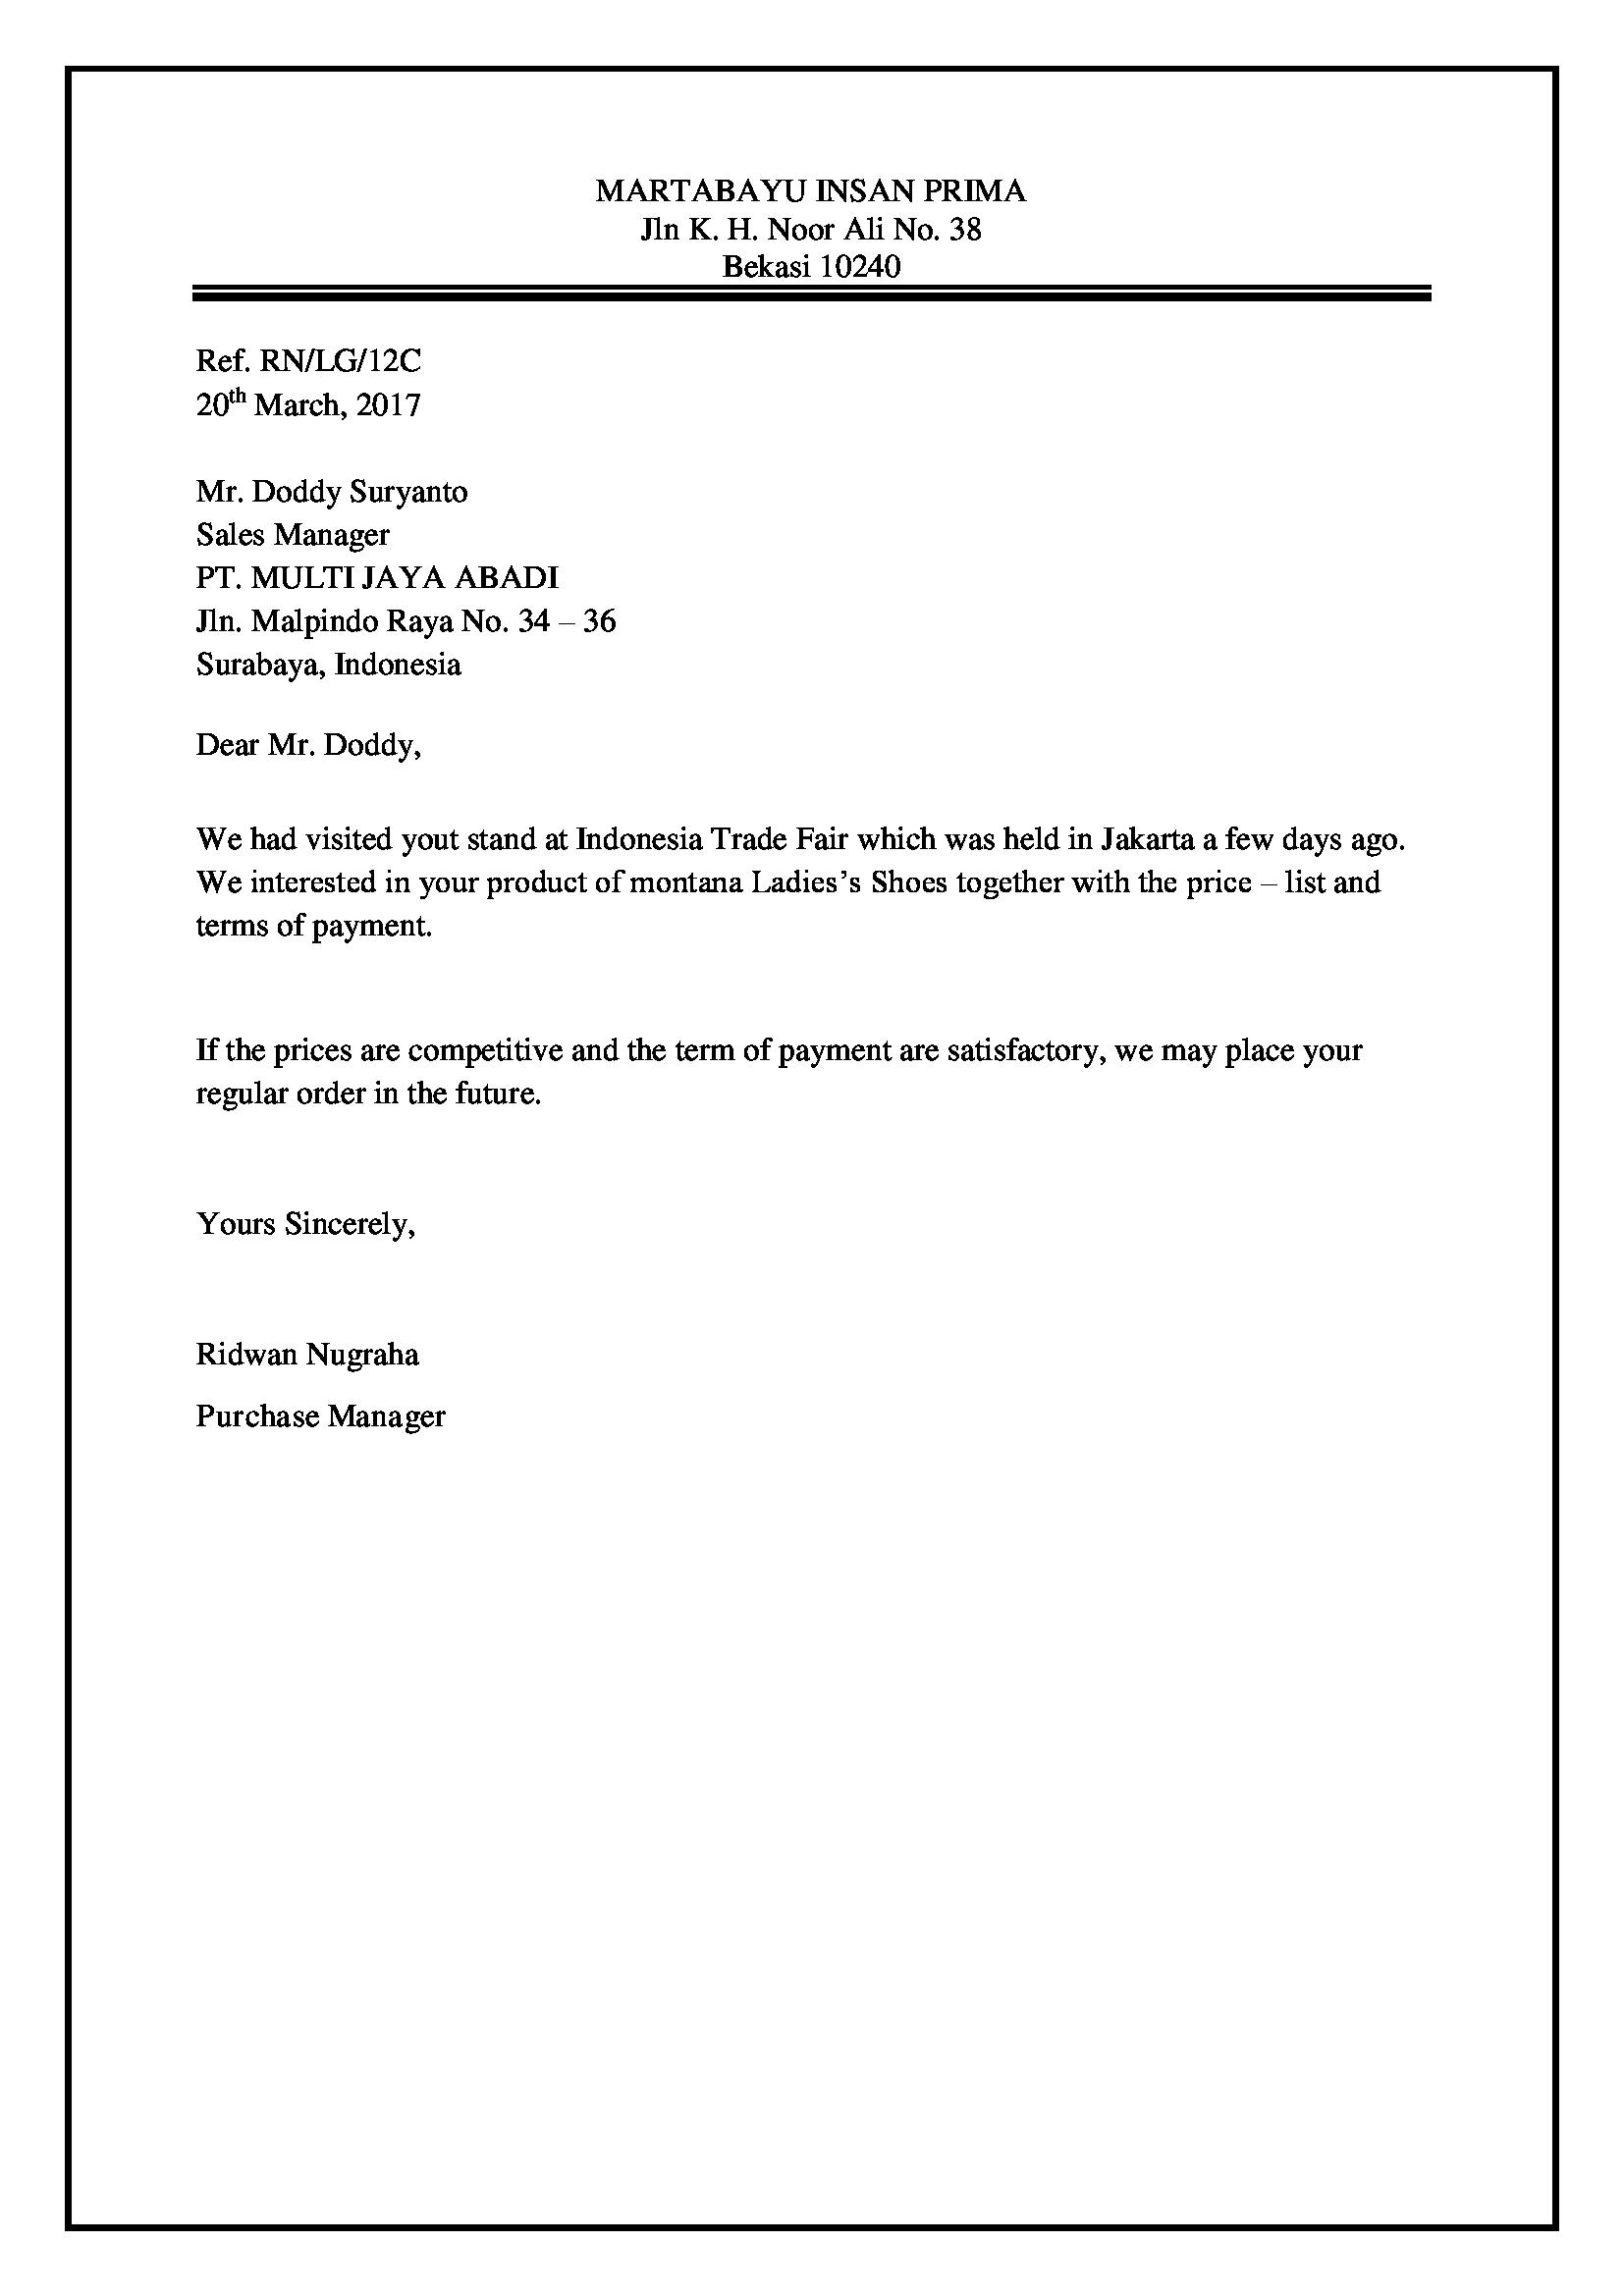 Full Block Style Letter Readtillend